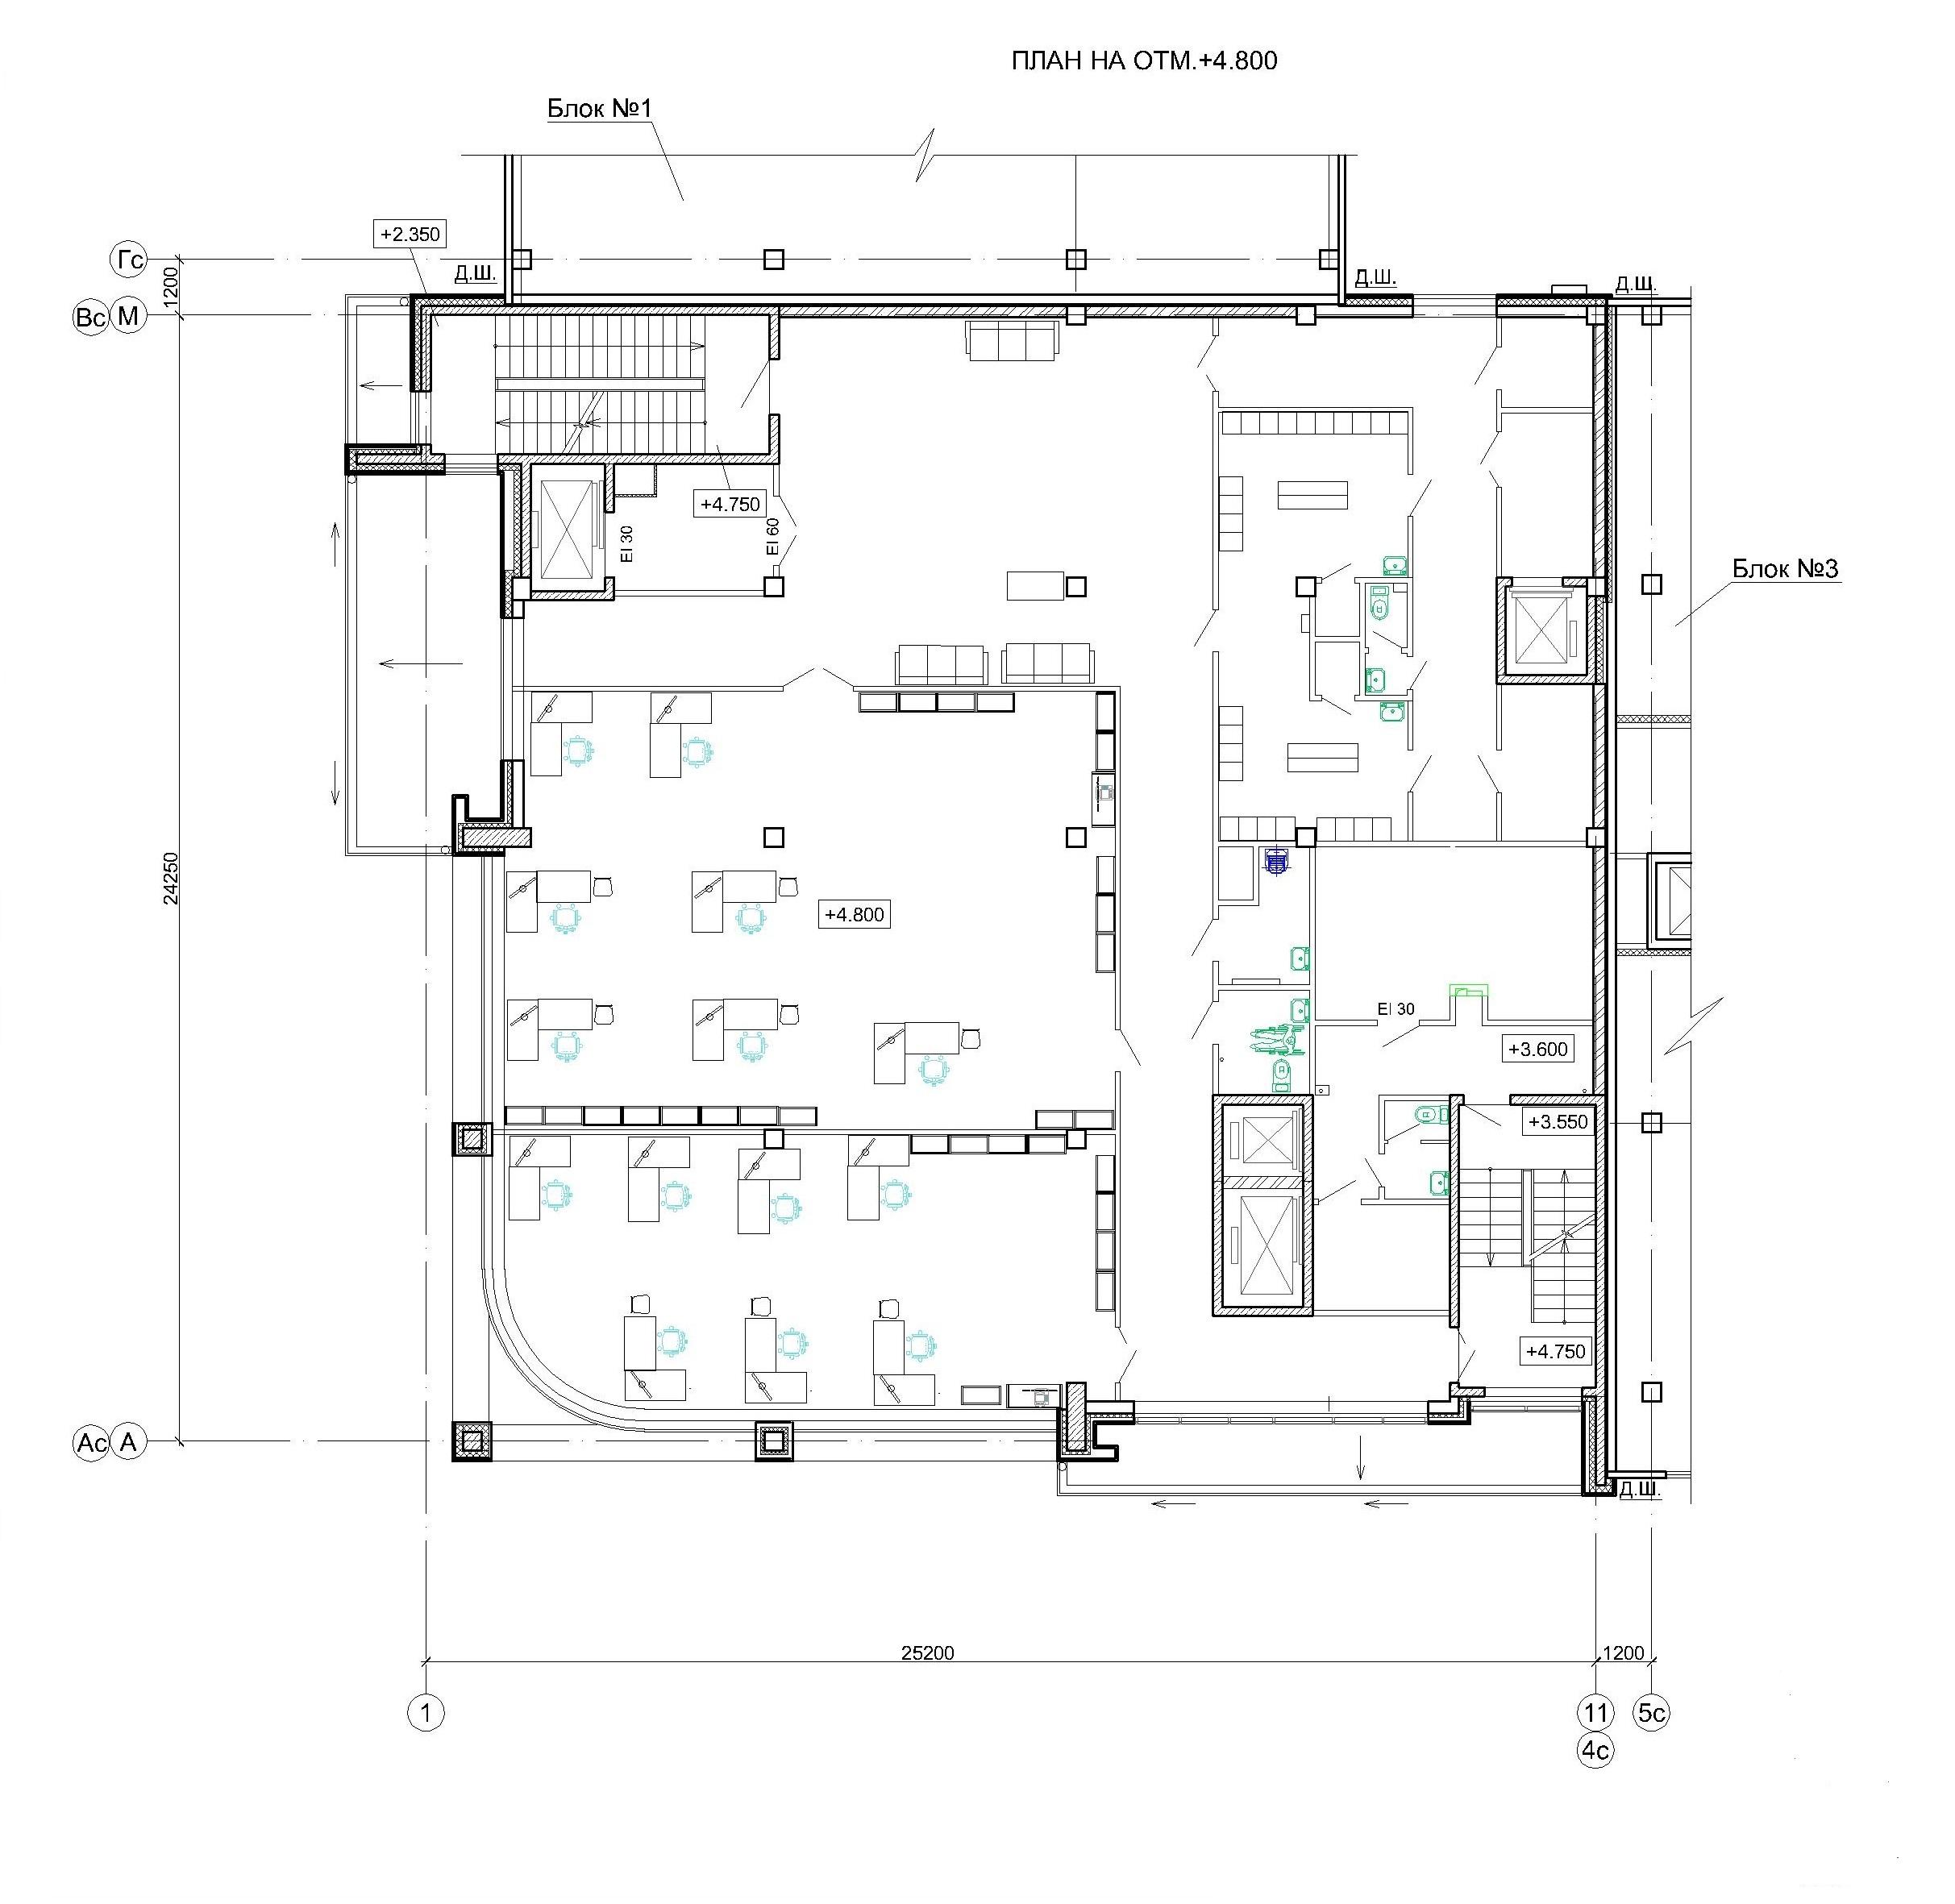 Проект логистического комплекса. План на отм. +4.800 (блок 2)